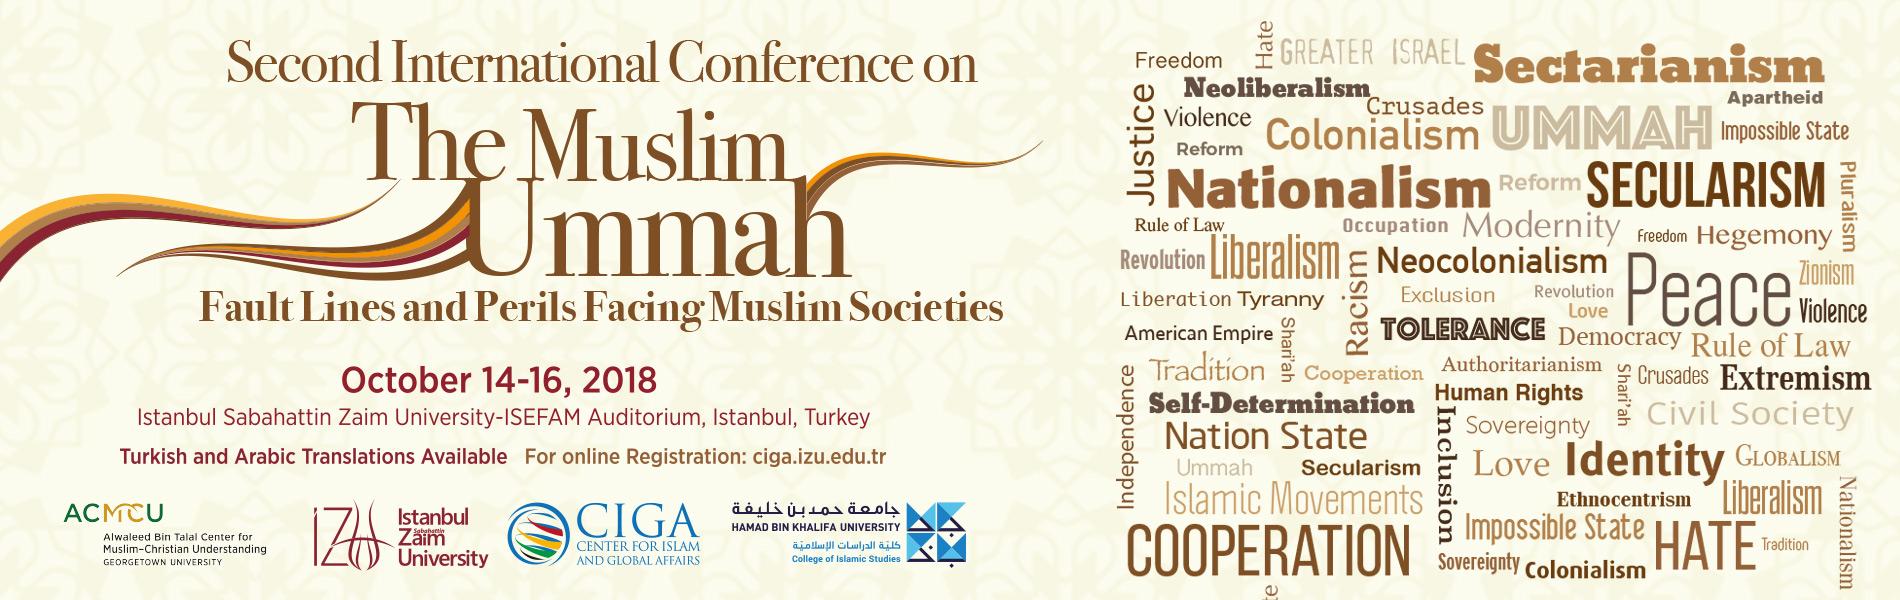 CIGA 2. Muslim Ummah Conference Web Banner